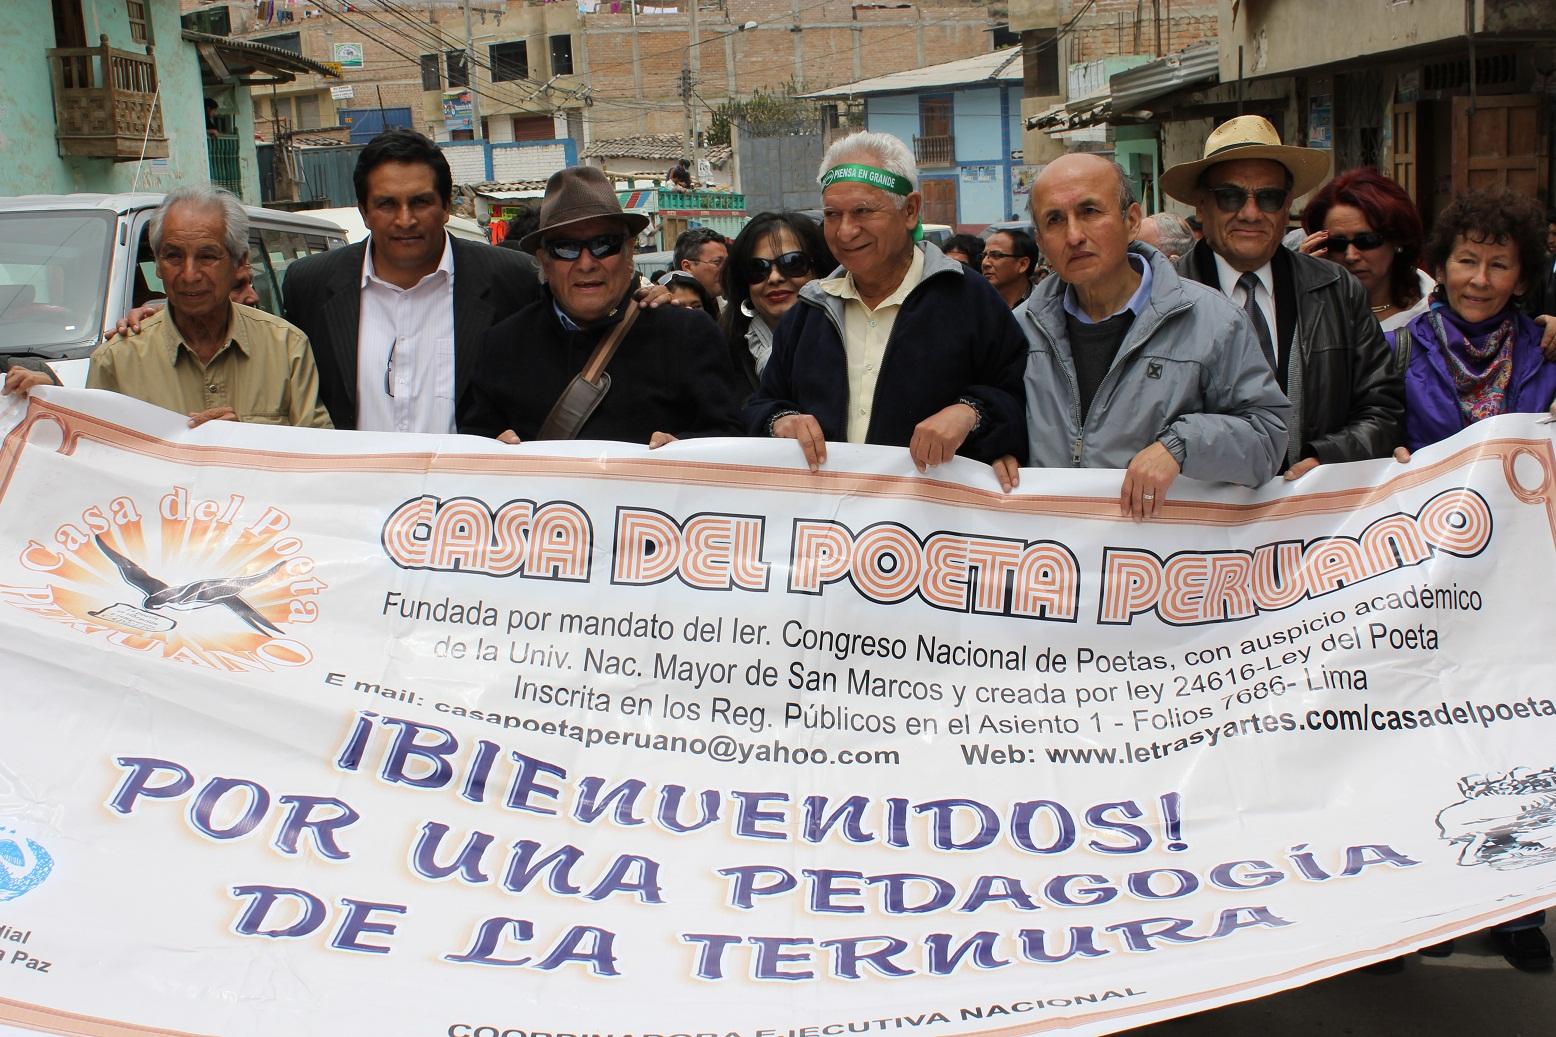 HUMBERTO PINEDO MENDOZA: CONGRESO DE POETAS DE BAMBAMARCA